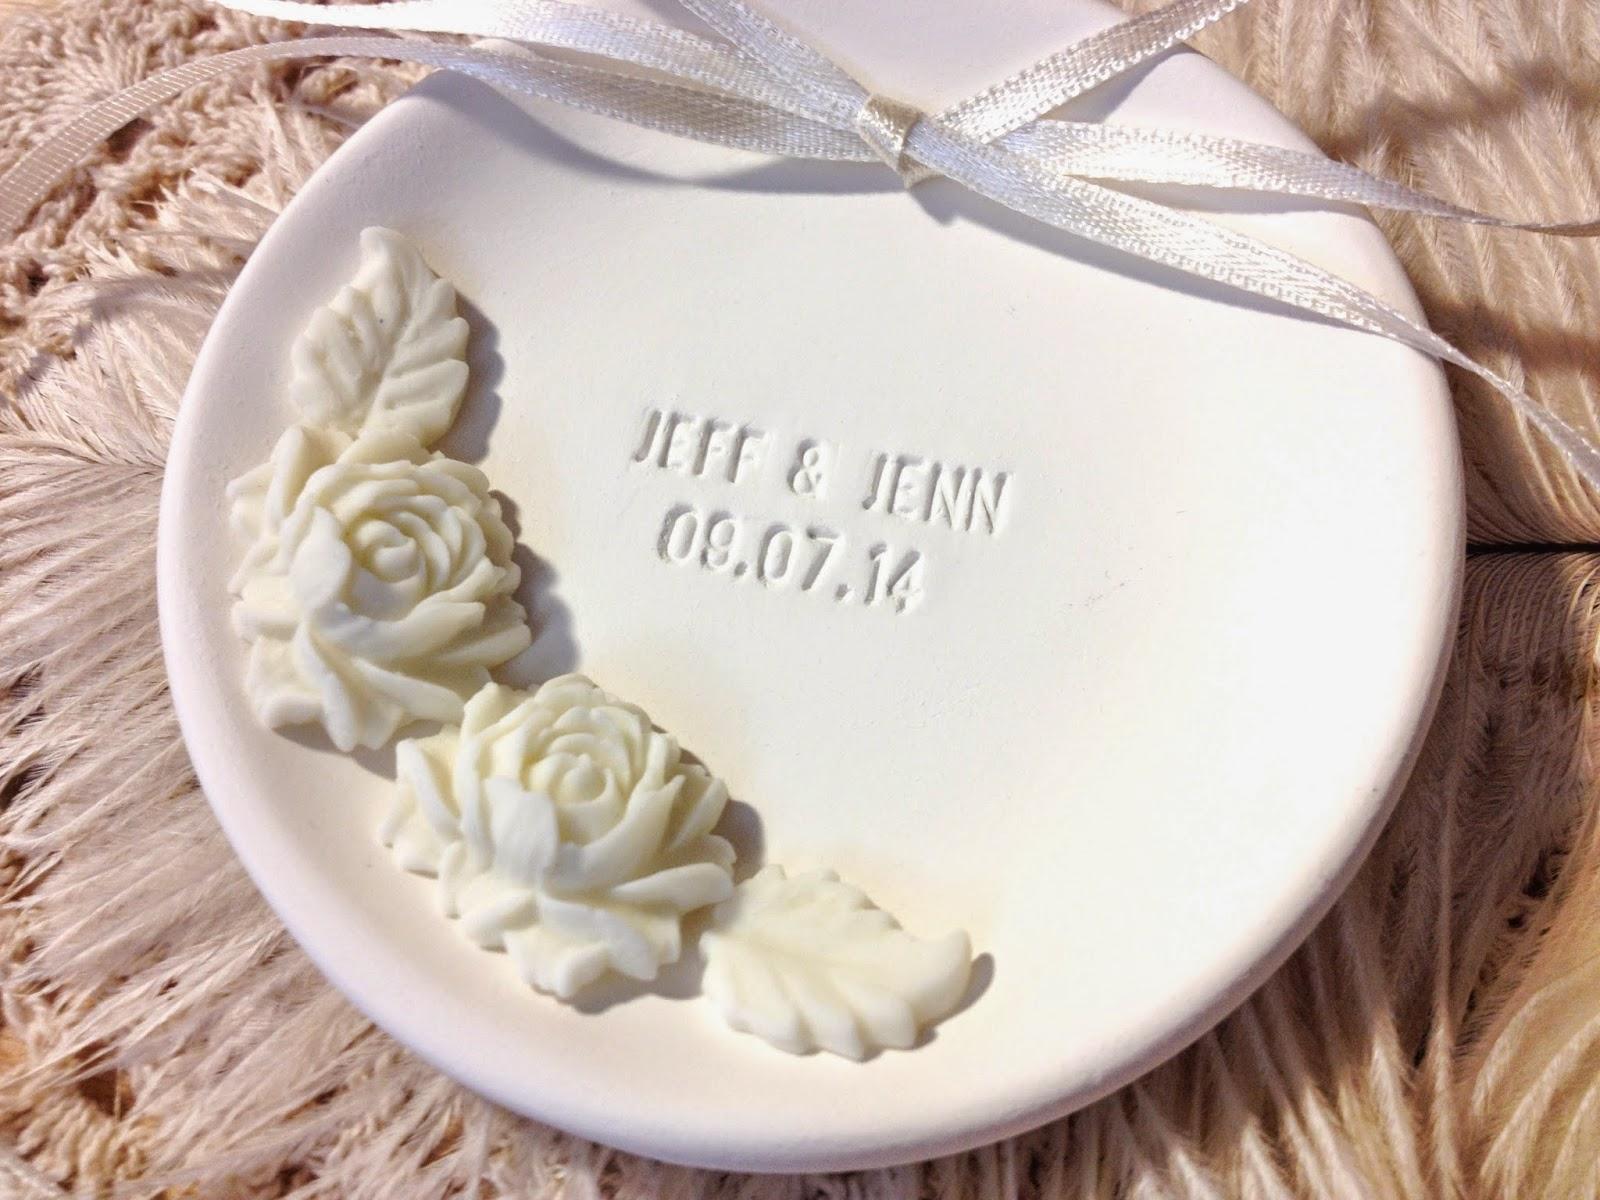 cupidsatelier blogspot handmade wedding rings Blog of CupidsAtelier Custom Handmade Wedding Ring Bearer Bowls Wedding Favours